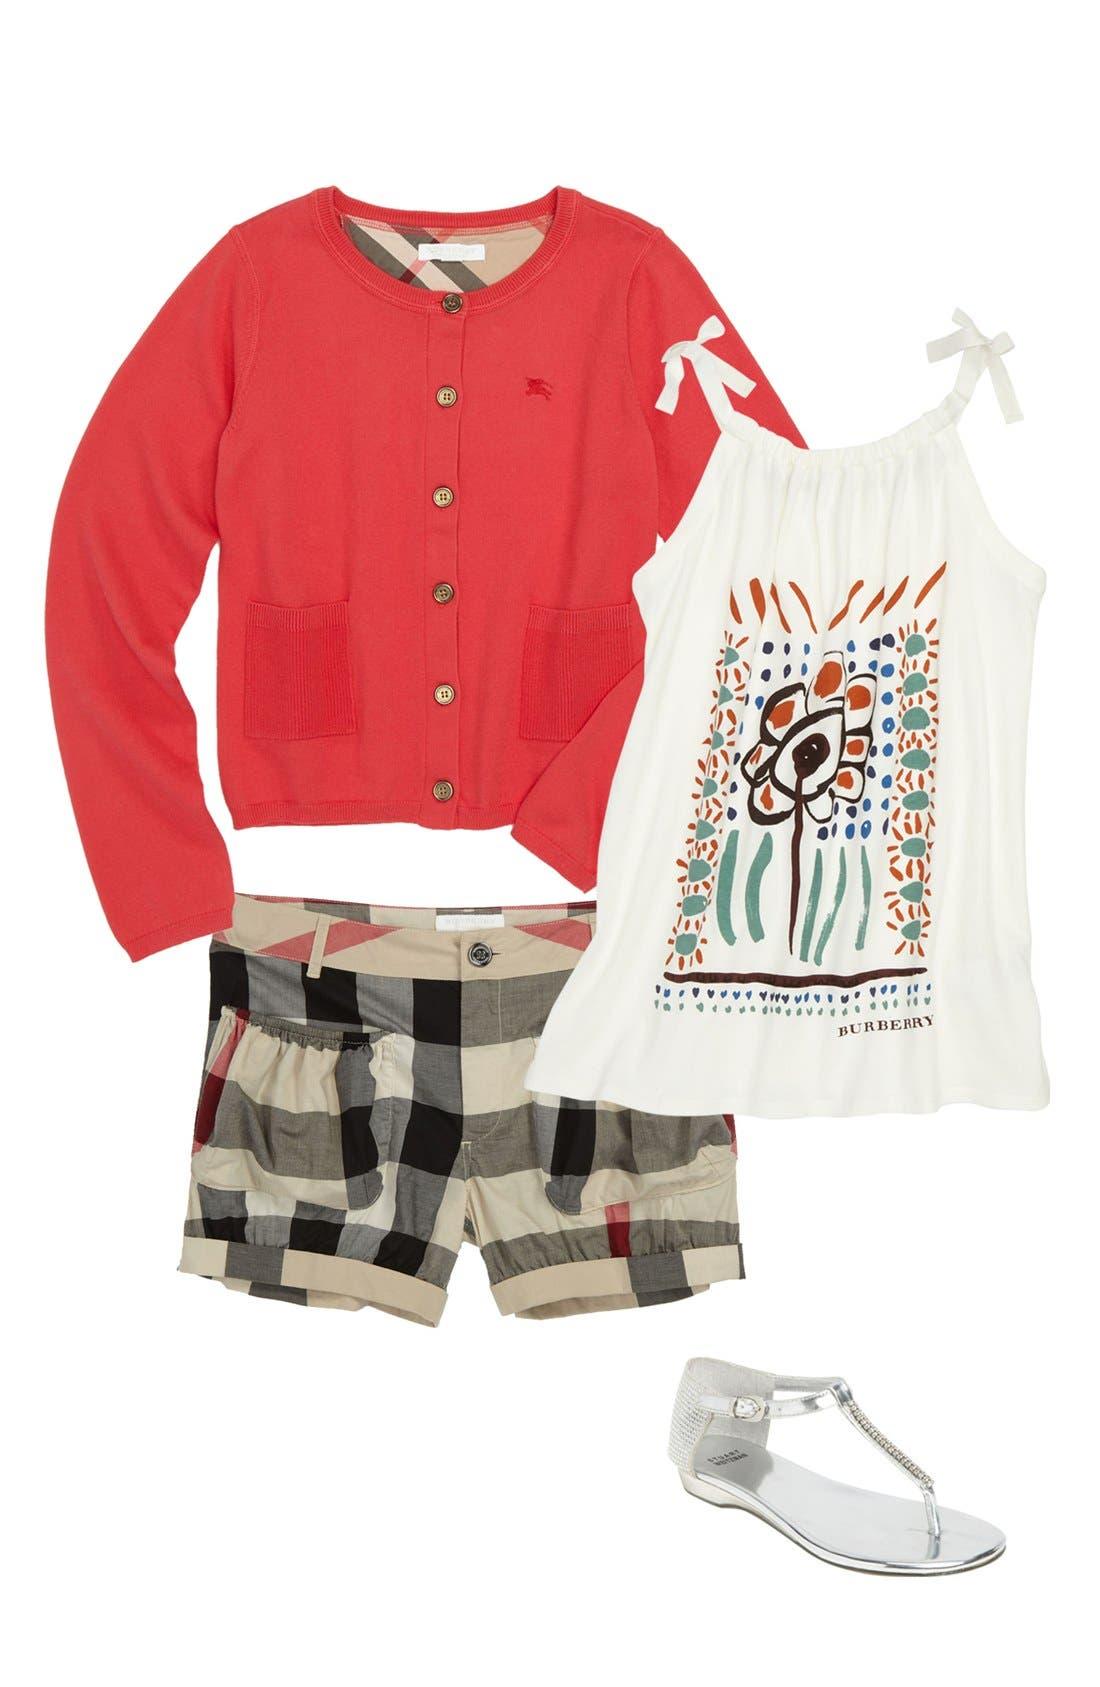 Main Image - Burberry Cardigan, Tank Top & Shorts (Little Girls & Big Girls)